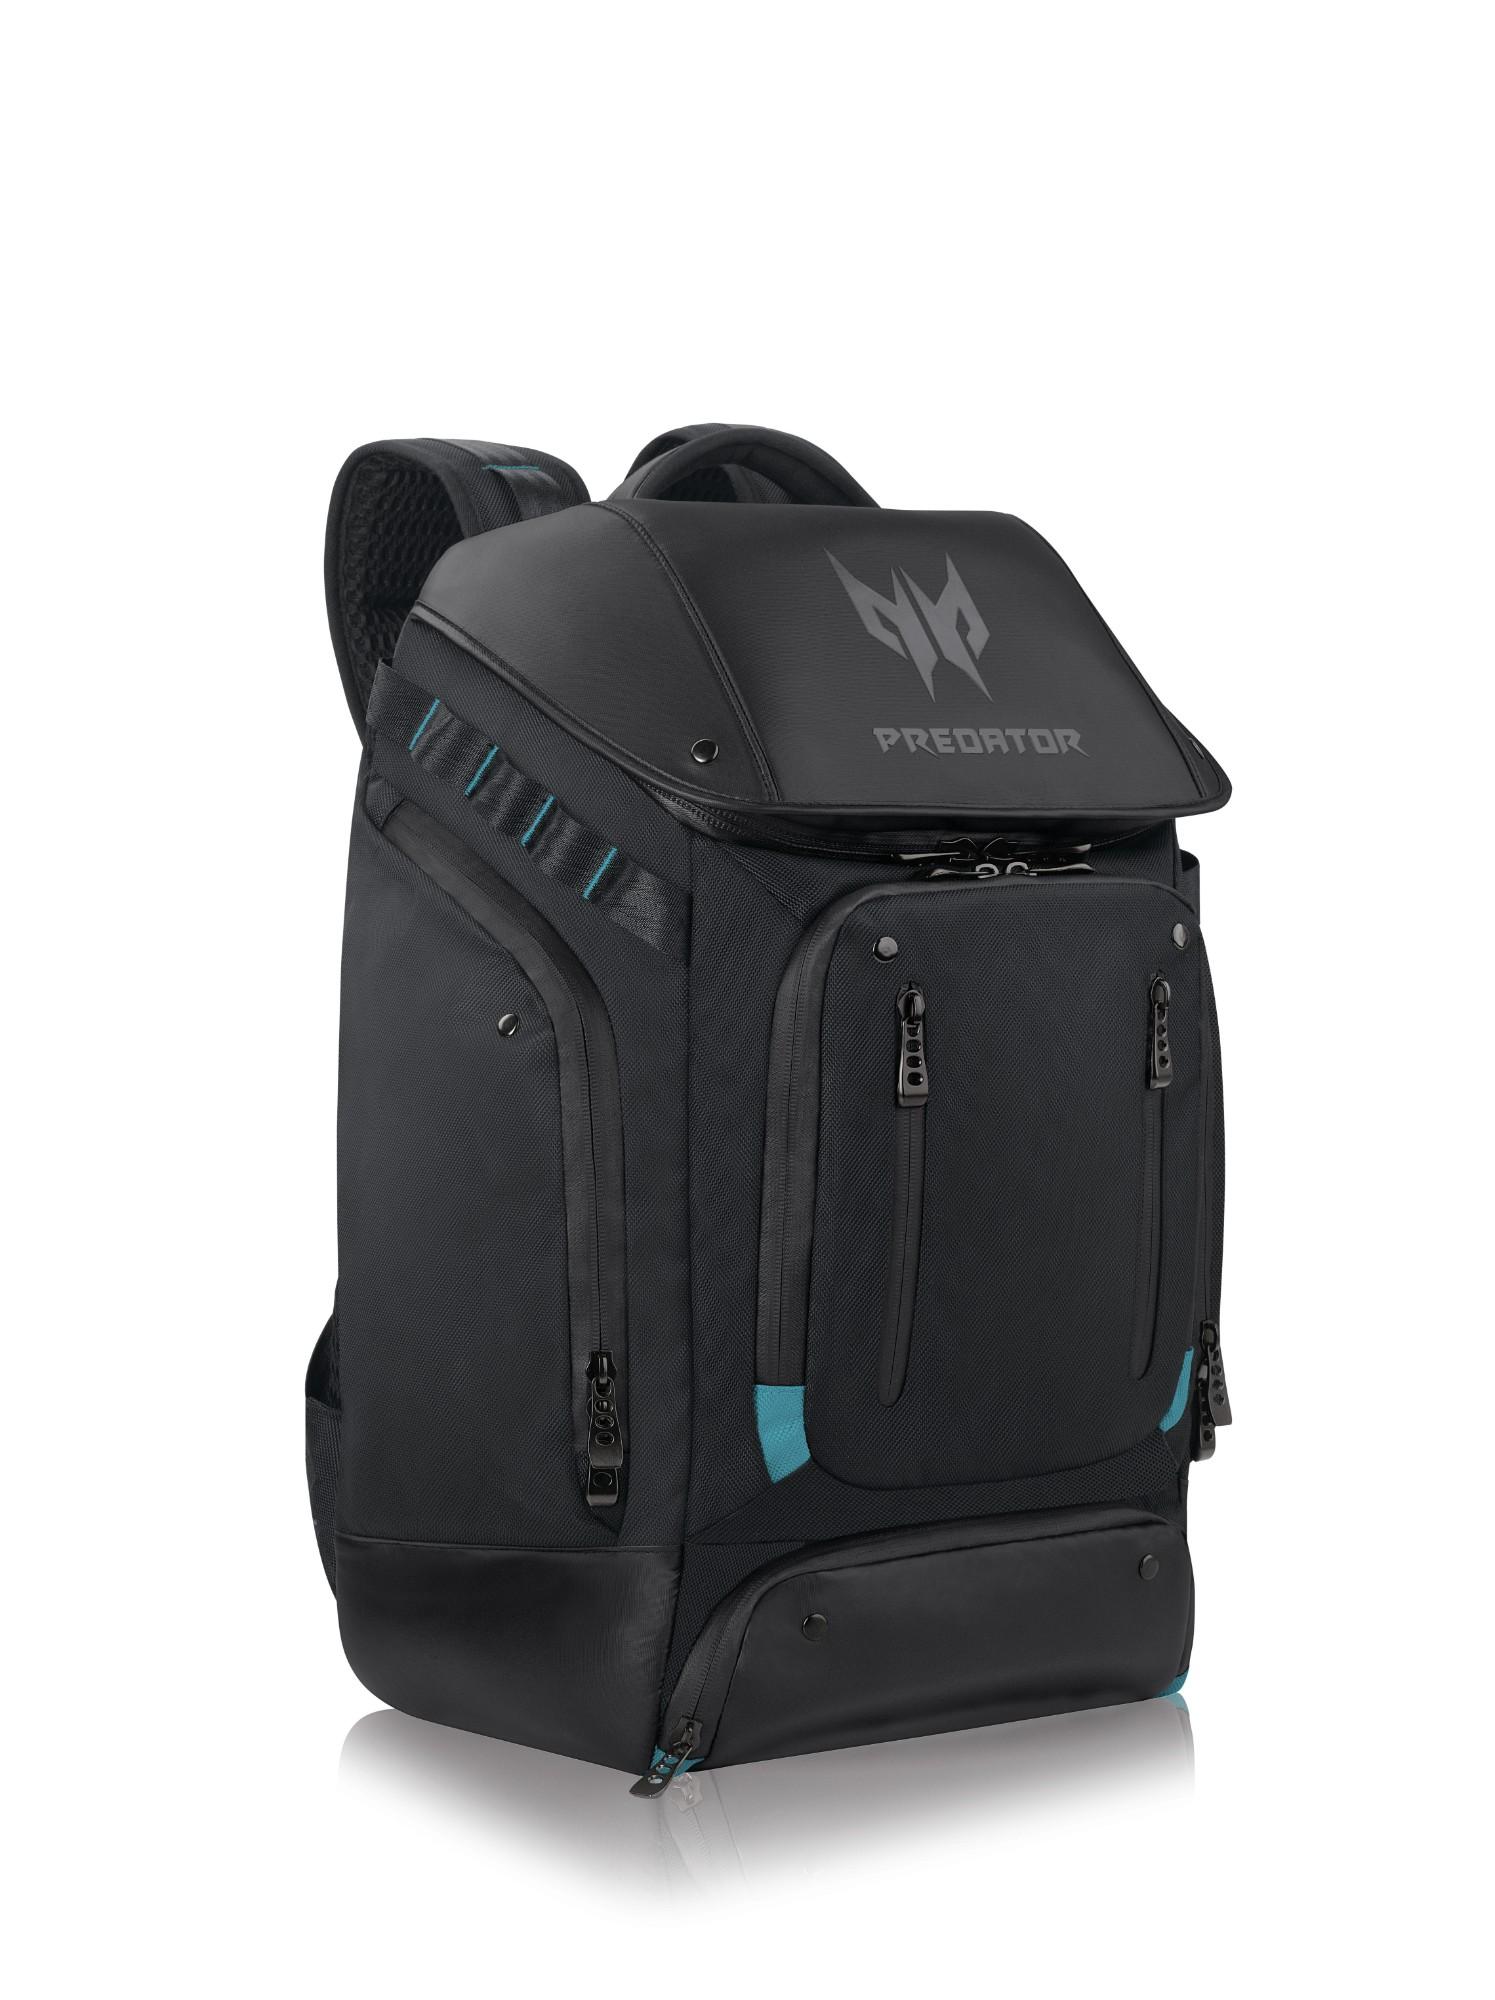 Acer Predator Utility backpack Polyester Black,Blue